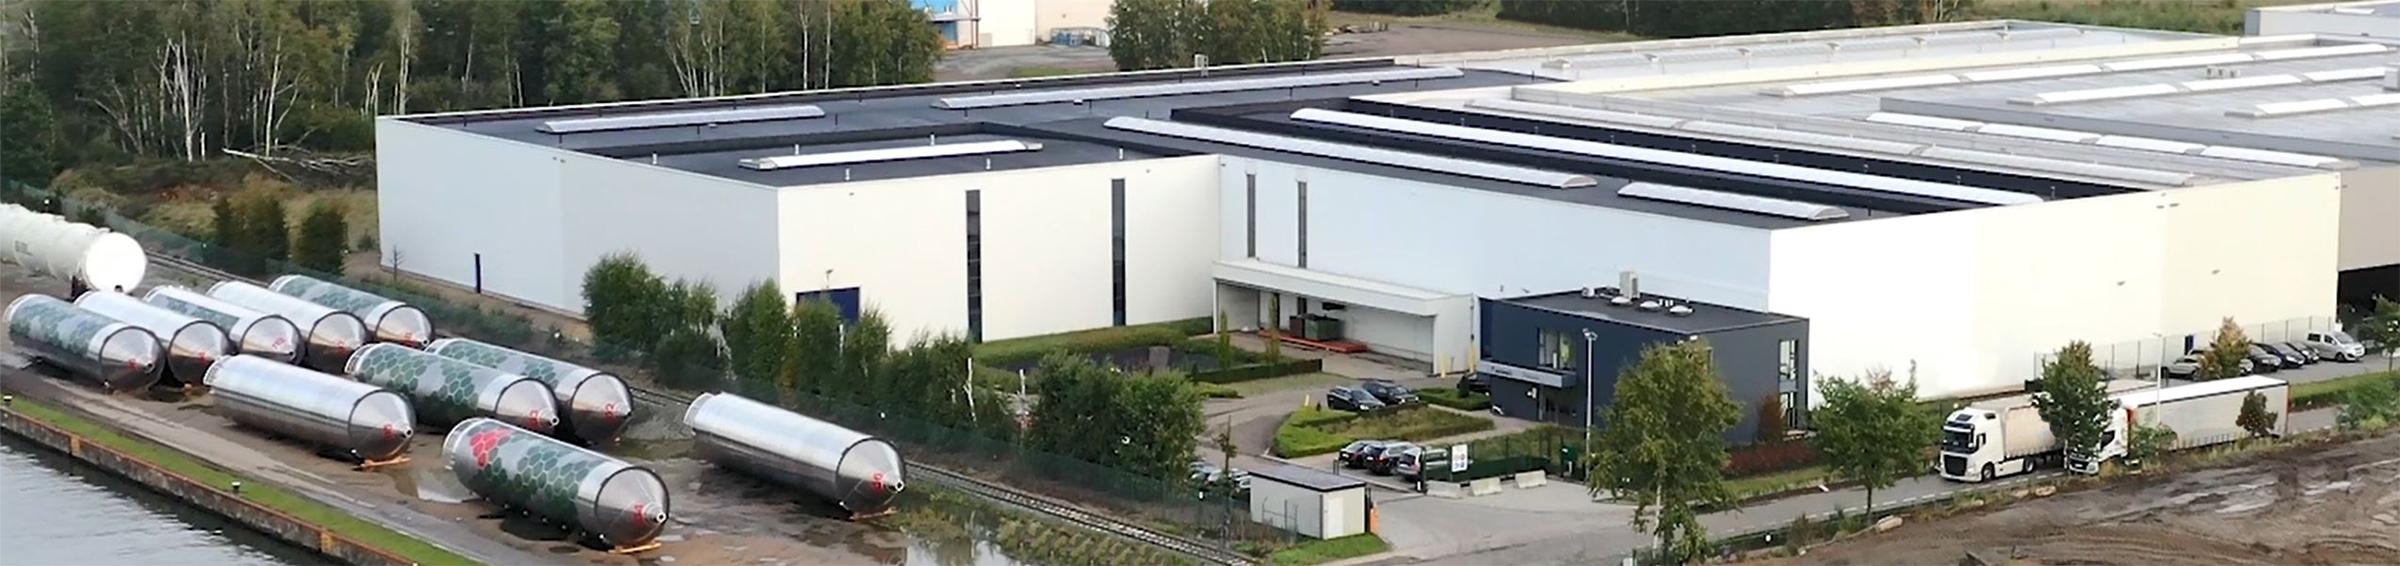 Decomecc, service center, aluminium, steel, stainless steel, company view